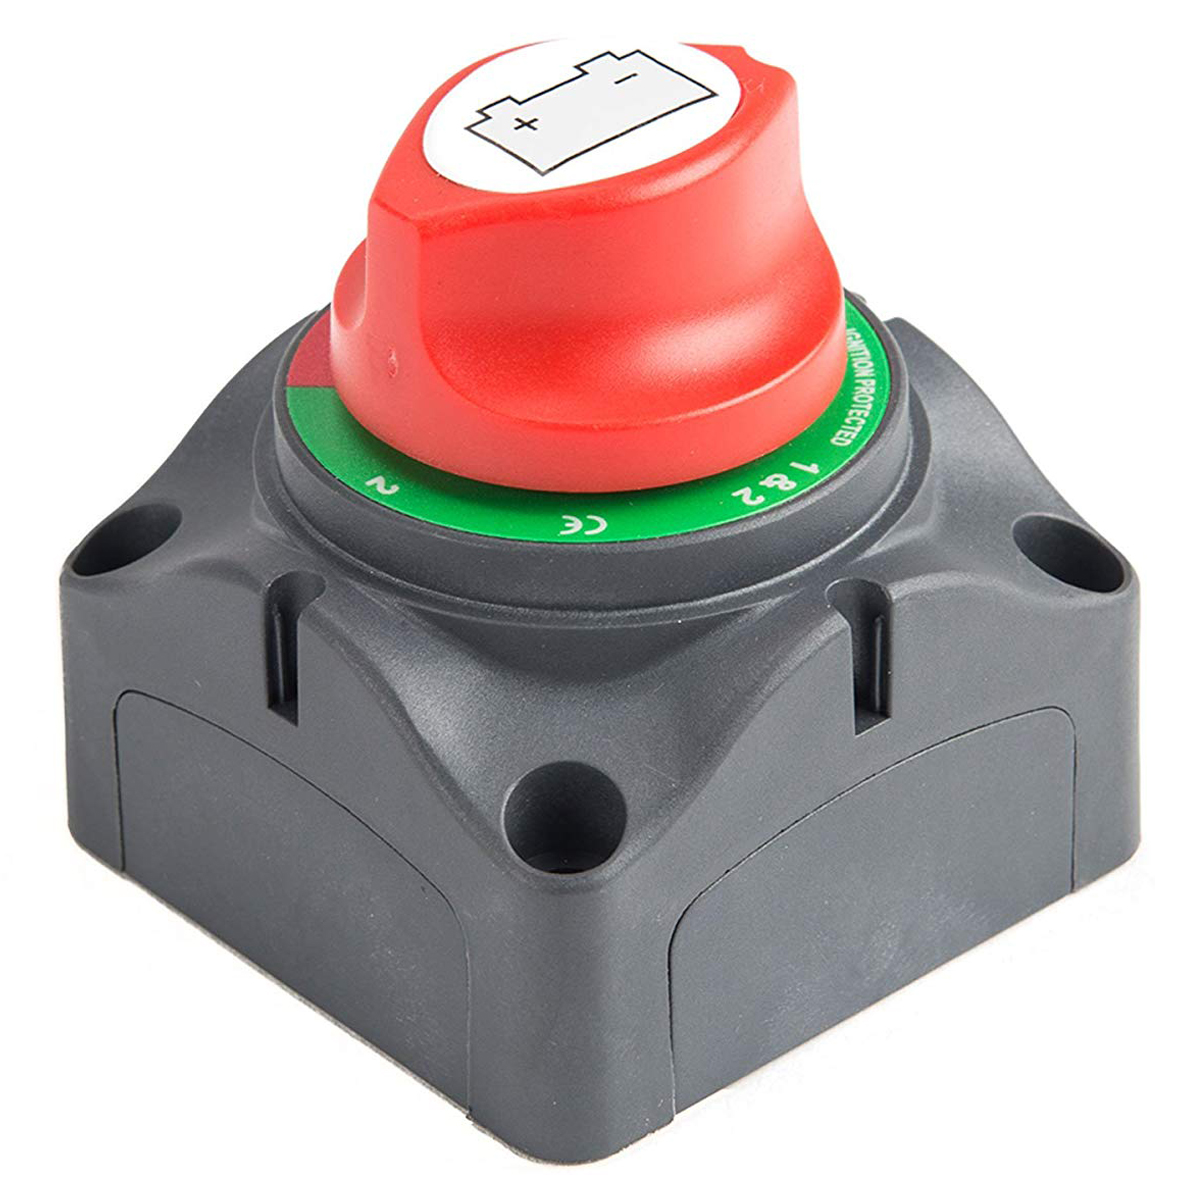 275//1250 Amps Waterproof Heavy Duty Battery Isolator Switch LotFancy Battery Switch 6V 12V 24V 48V 60V Battery Disconnect Master Cut Shut Off Switch for Marine Boat RV ATV UTV Vehicles